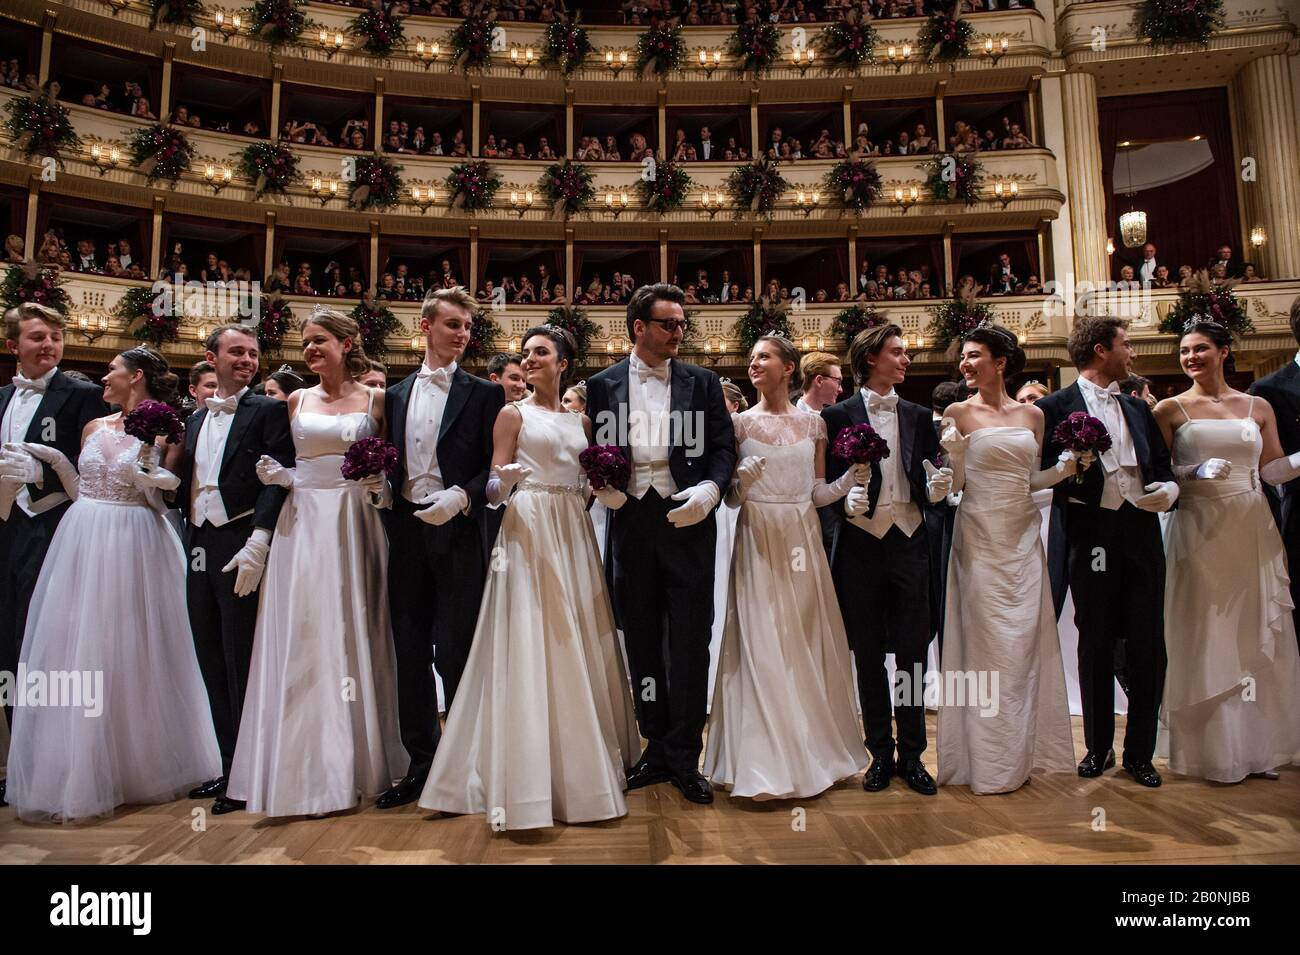 Vienna, Austria. 20th Feb, 2020. Dancers attend the Opera Ball at the State Opera House in Vienna, Austria, Feb. 20, 2020. The 2020 Vienna Opera Ball was held on Thursday night. Credit: Guo Chen/Xinhua/Alamy Live News Stock Photo